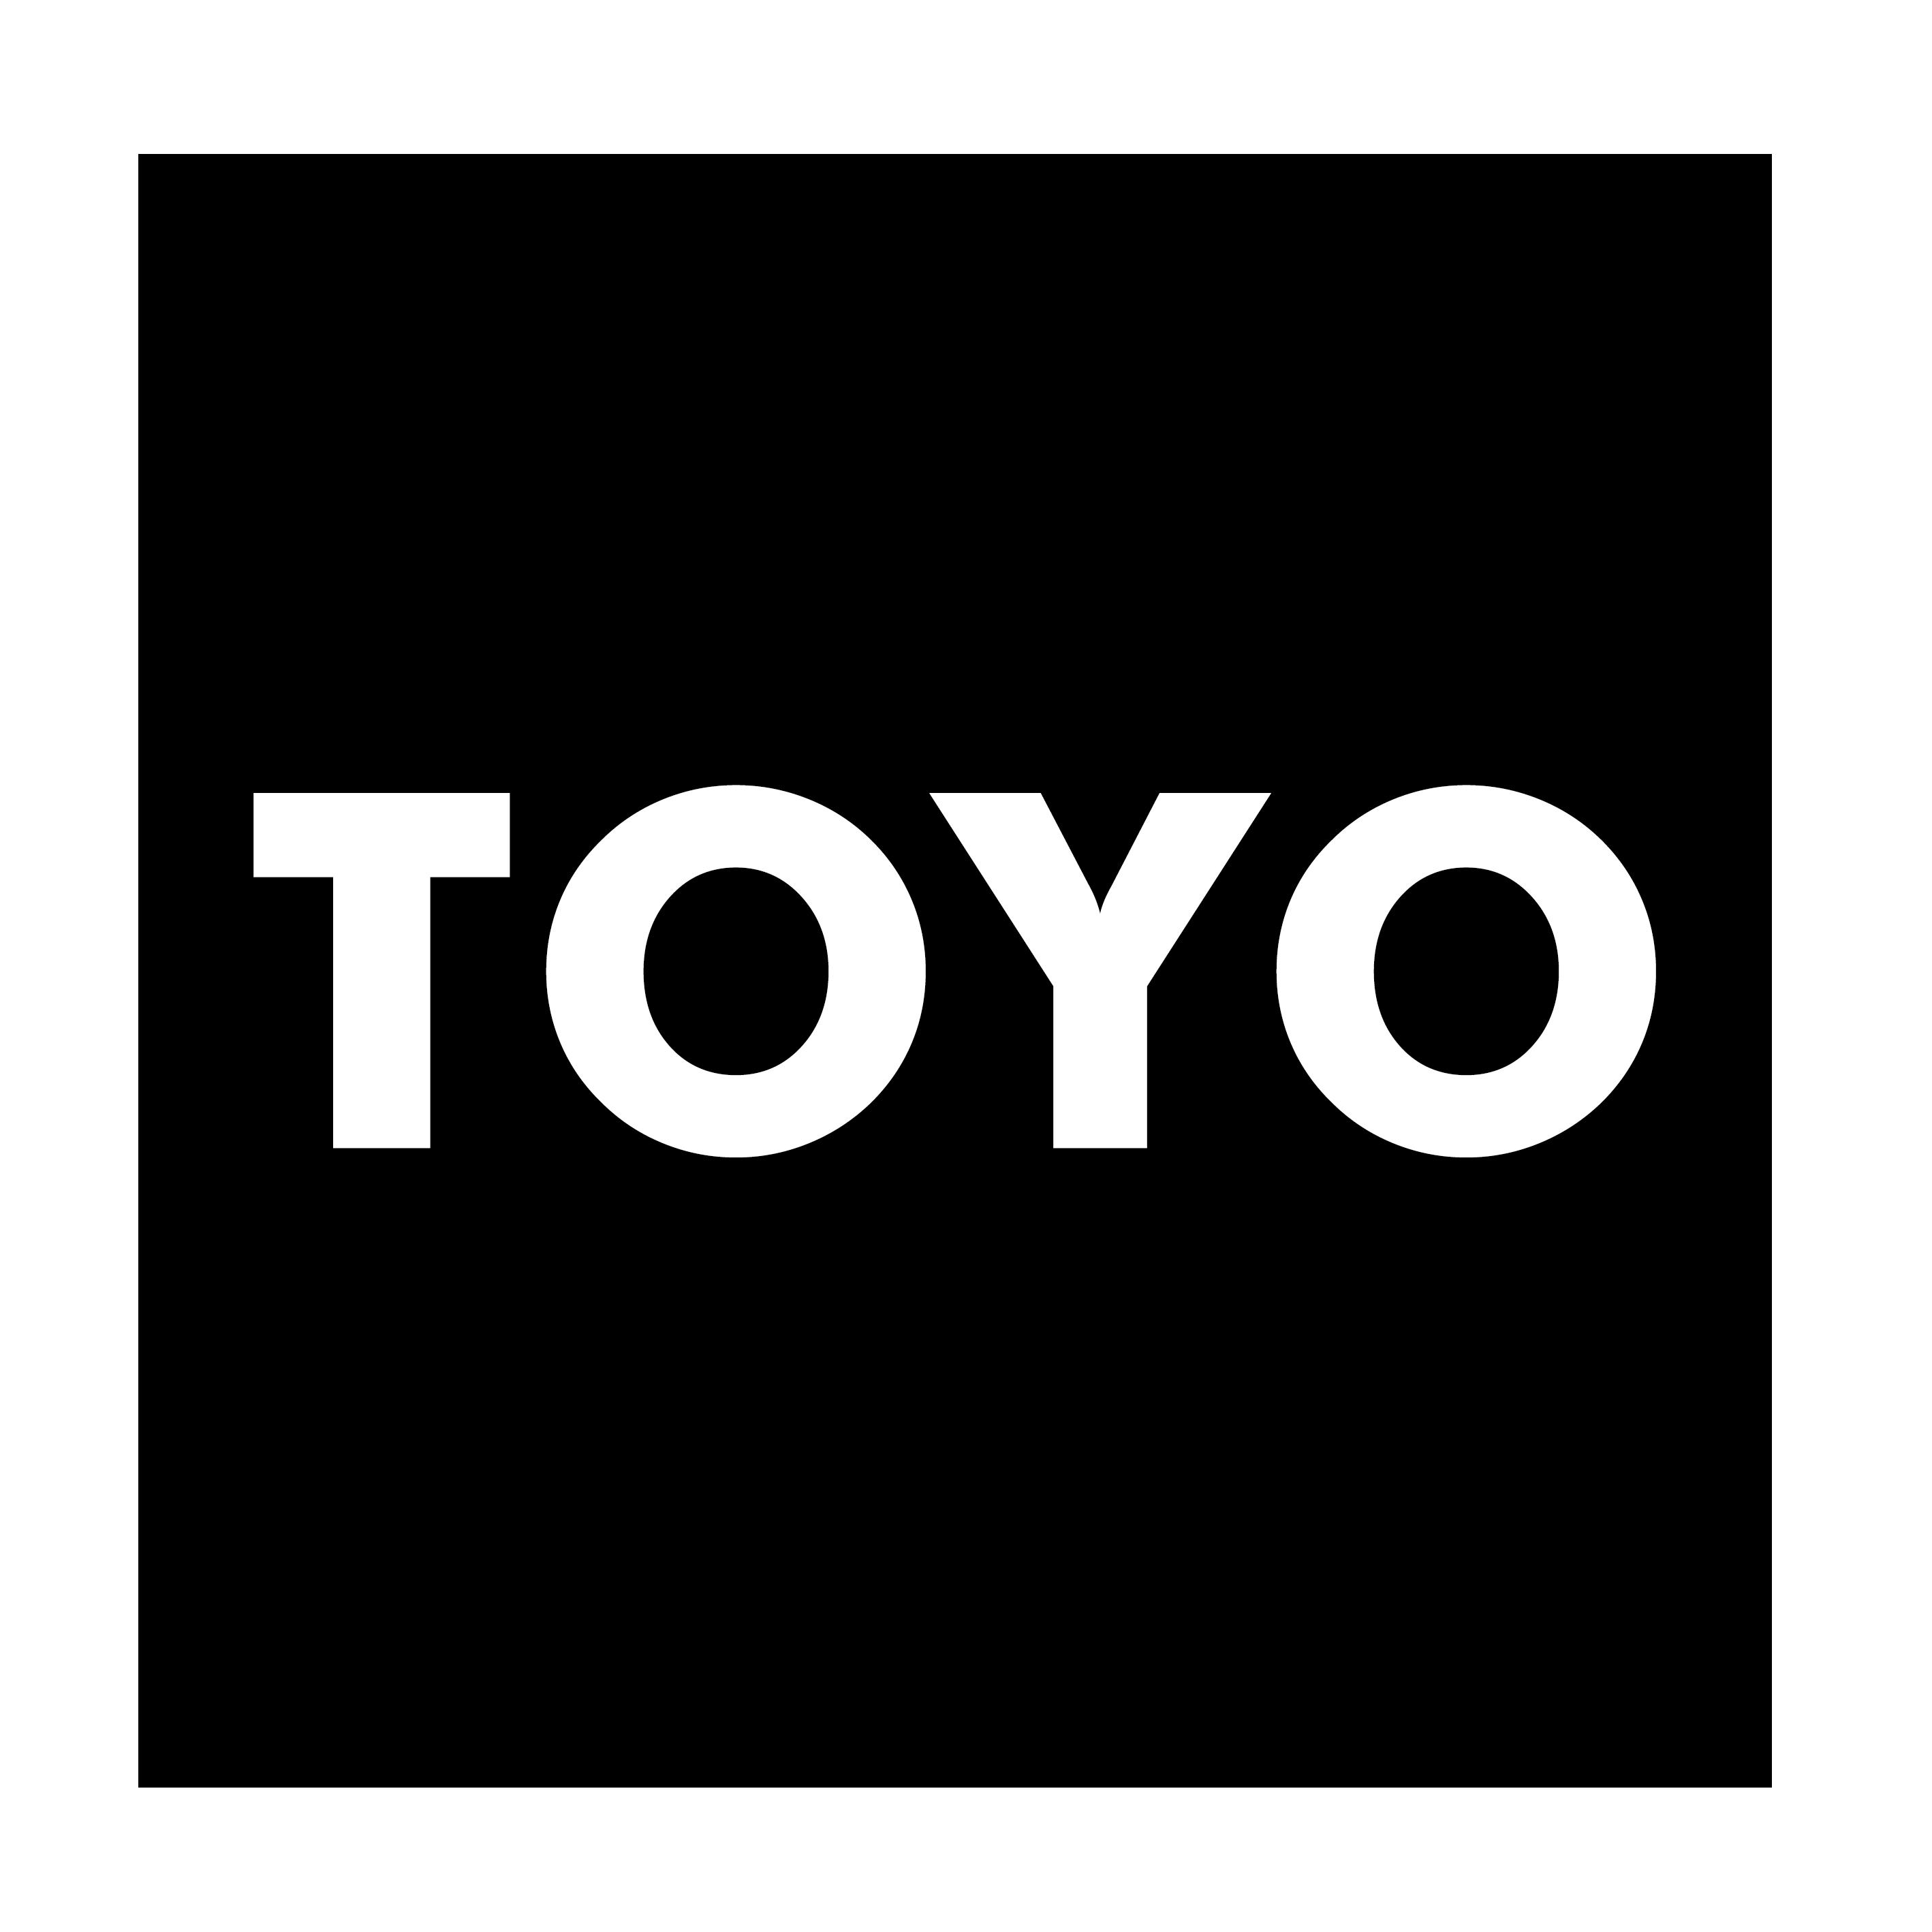 Mayro Toyo Signature